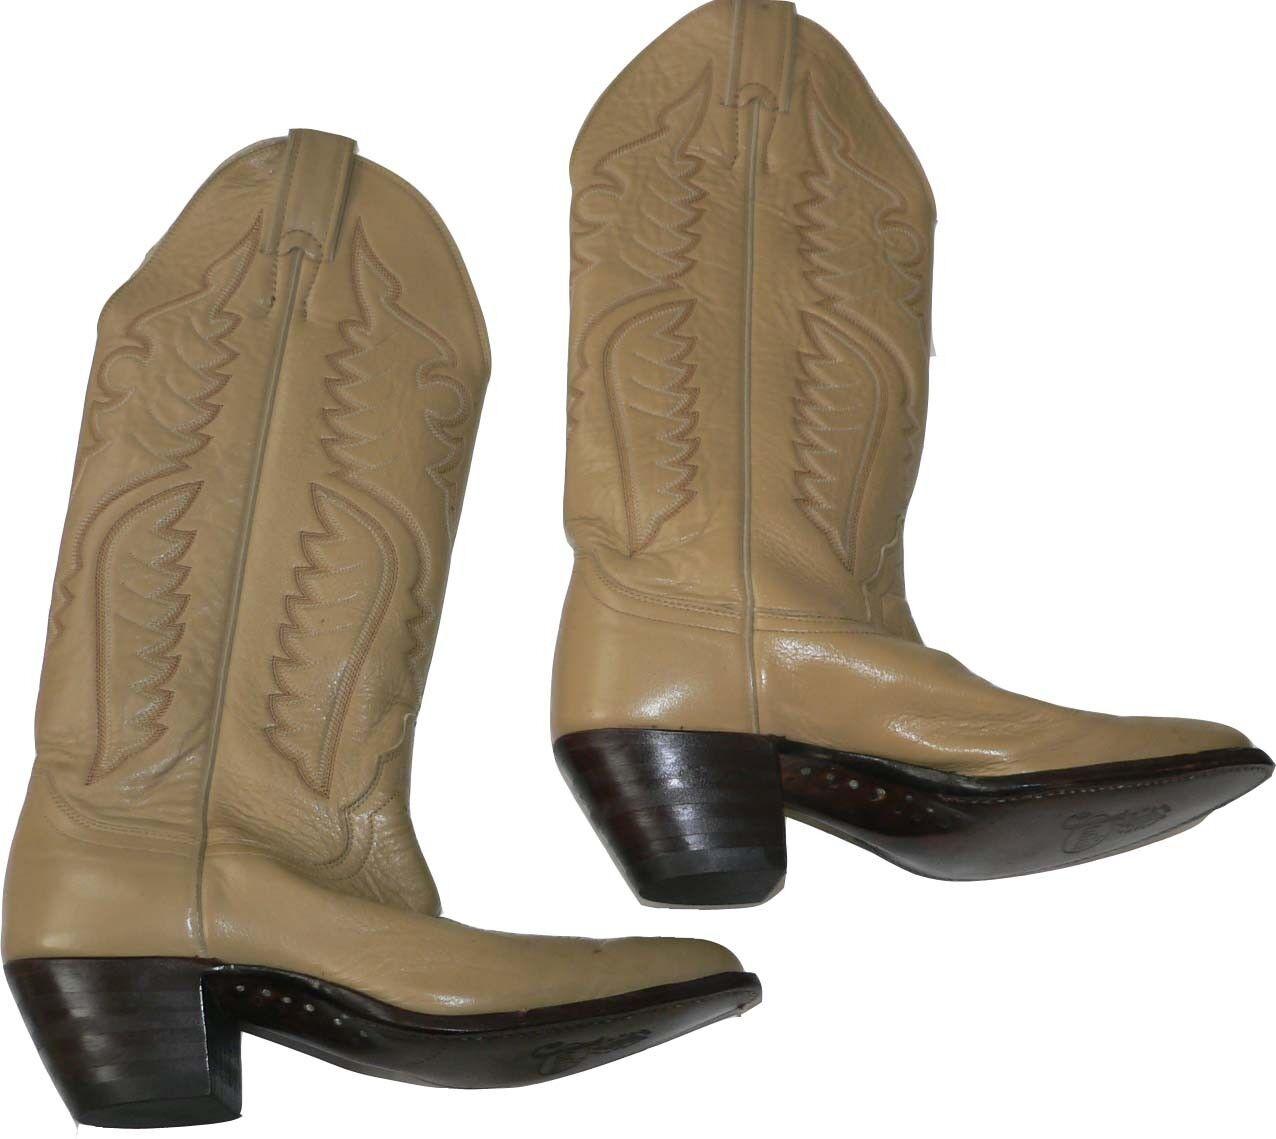 NEW Vintage JUSTIN Cowboy Western bottes bone femmes femmes femmes 5.5 A Narrow ladies tan a2e9f8